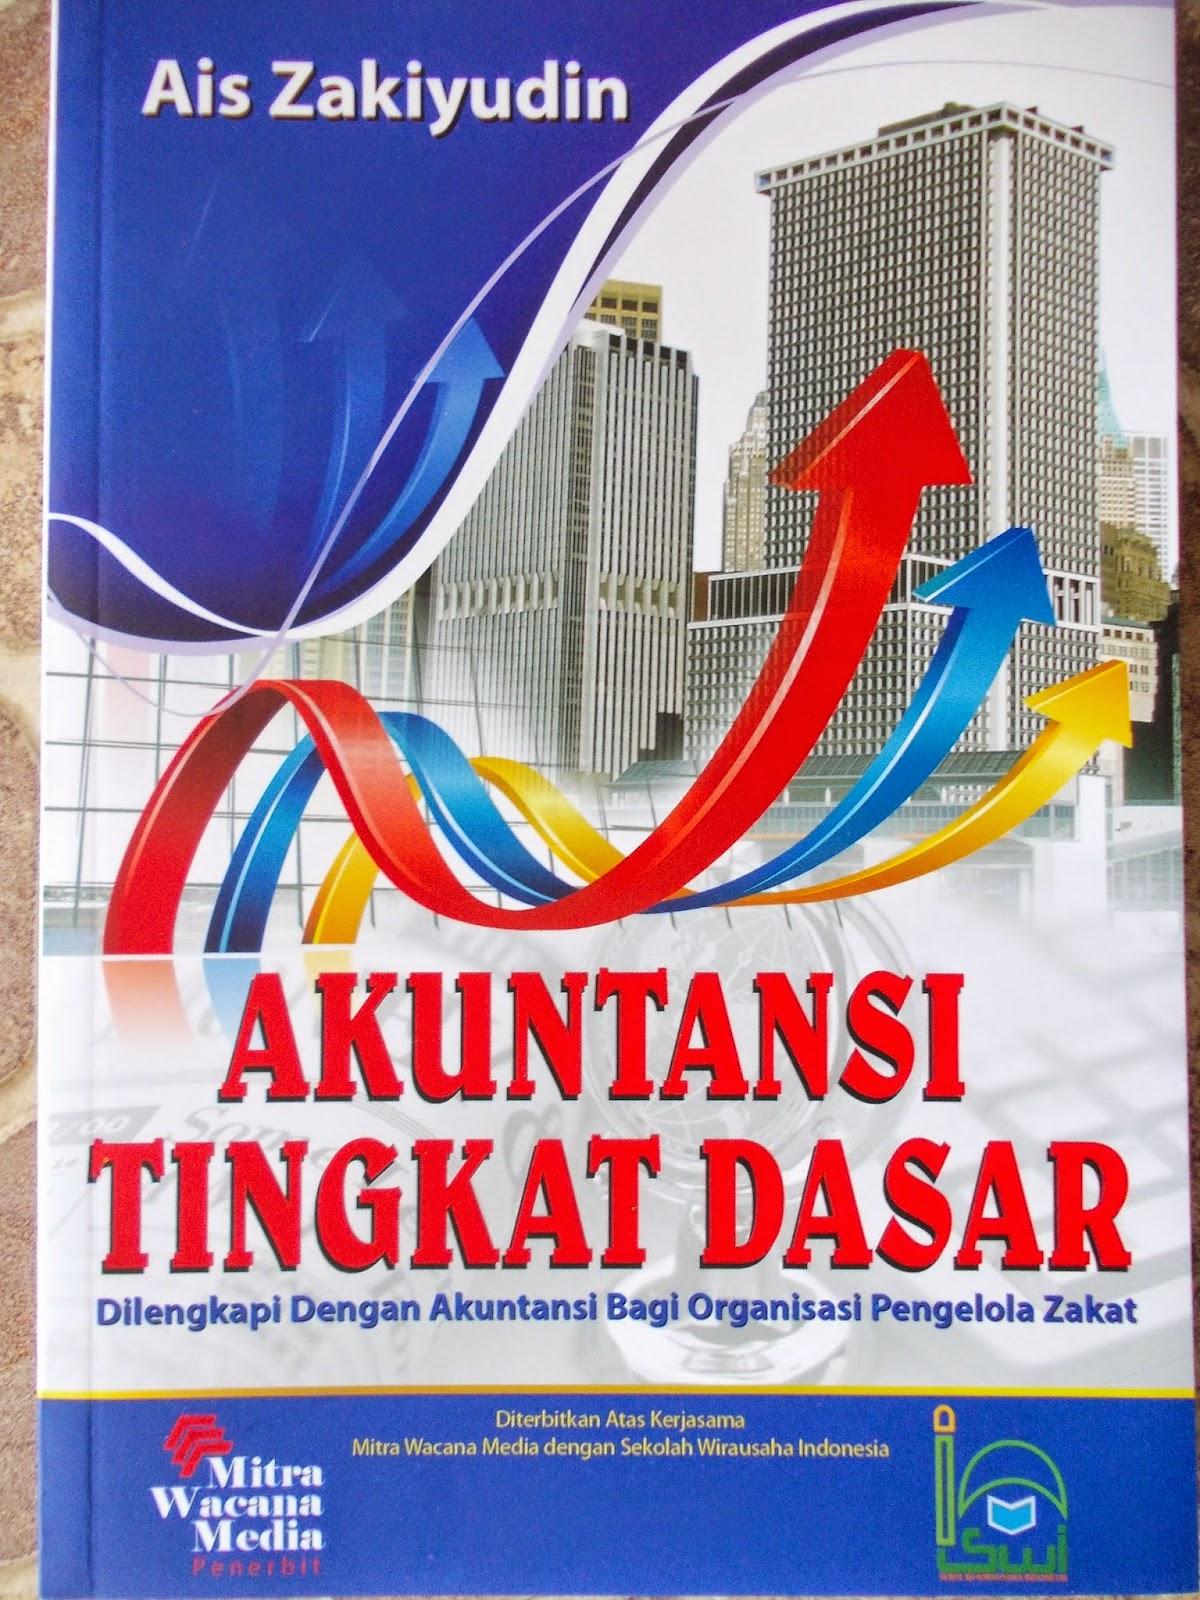 Ais Zakiyudin Judul Buku Akuntansi Tingkat Dasar